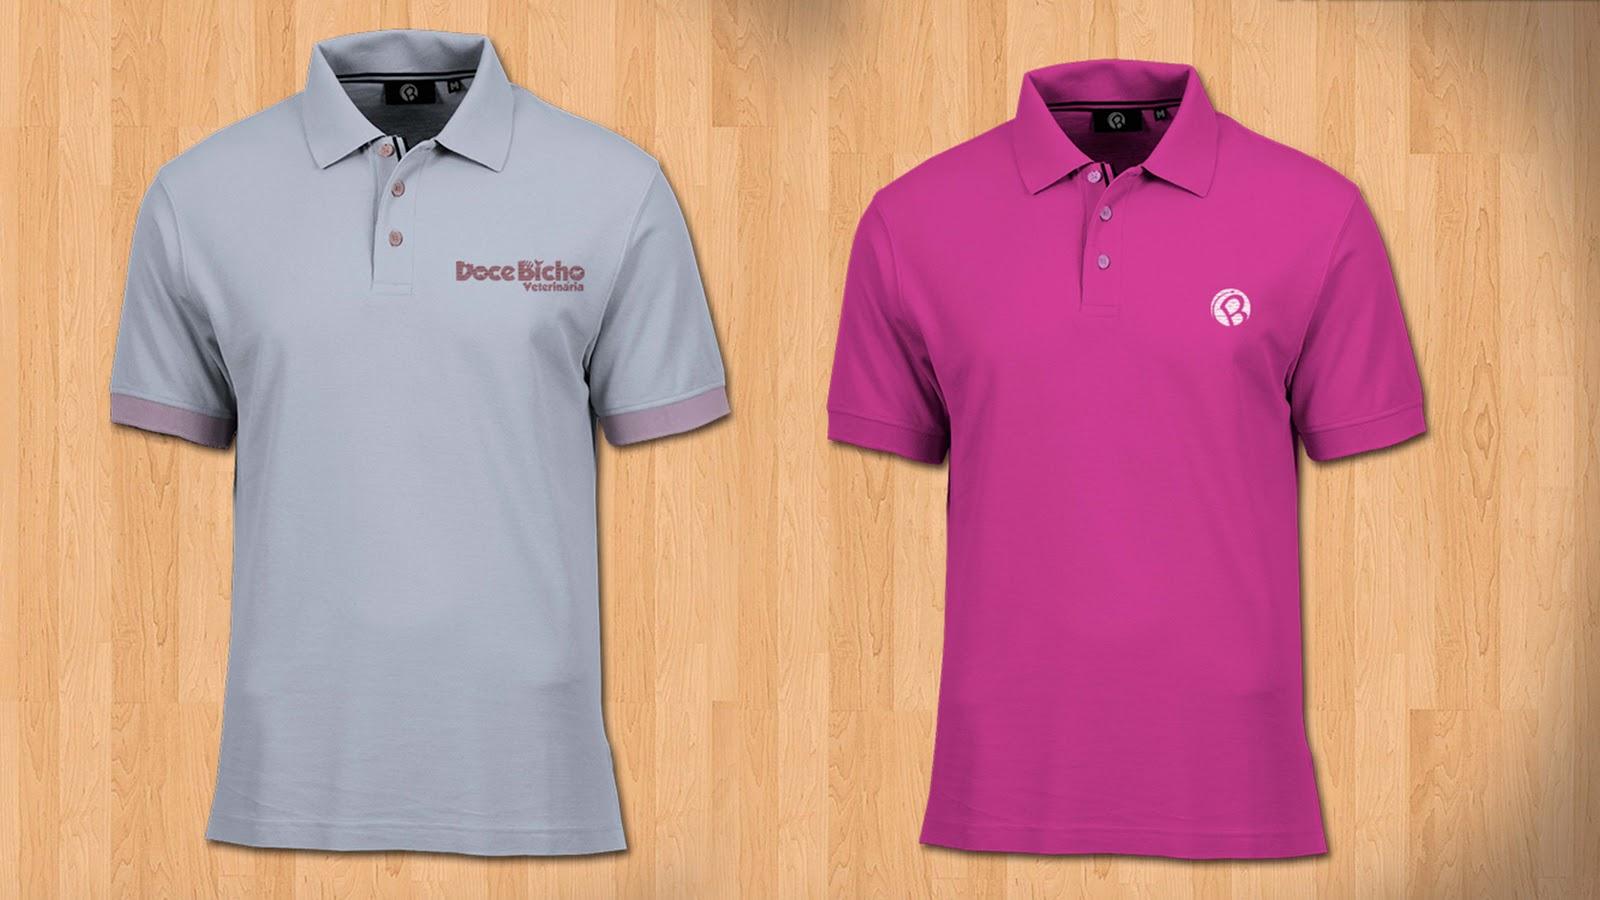 Free Psd Mockup Polo Shirt Graphic Temple